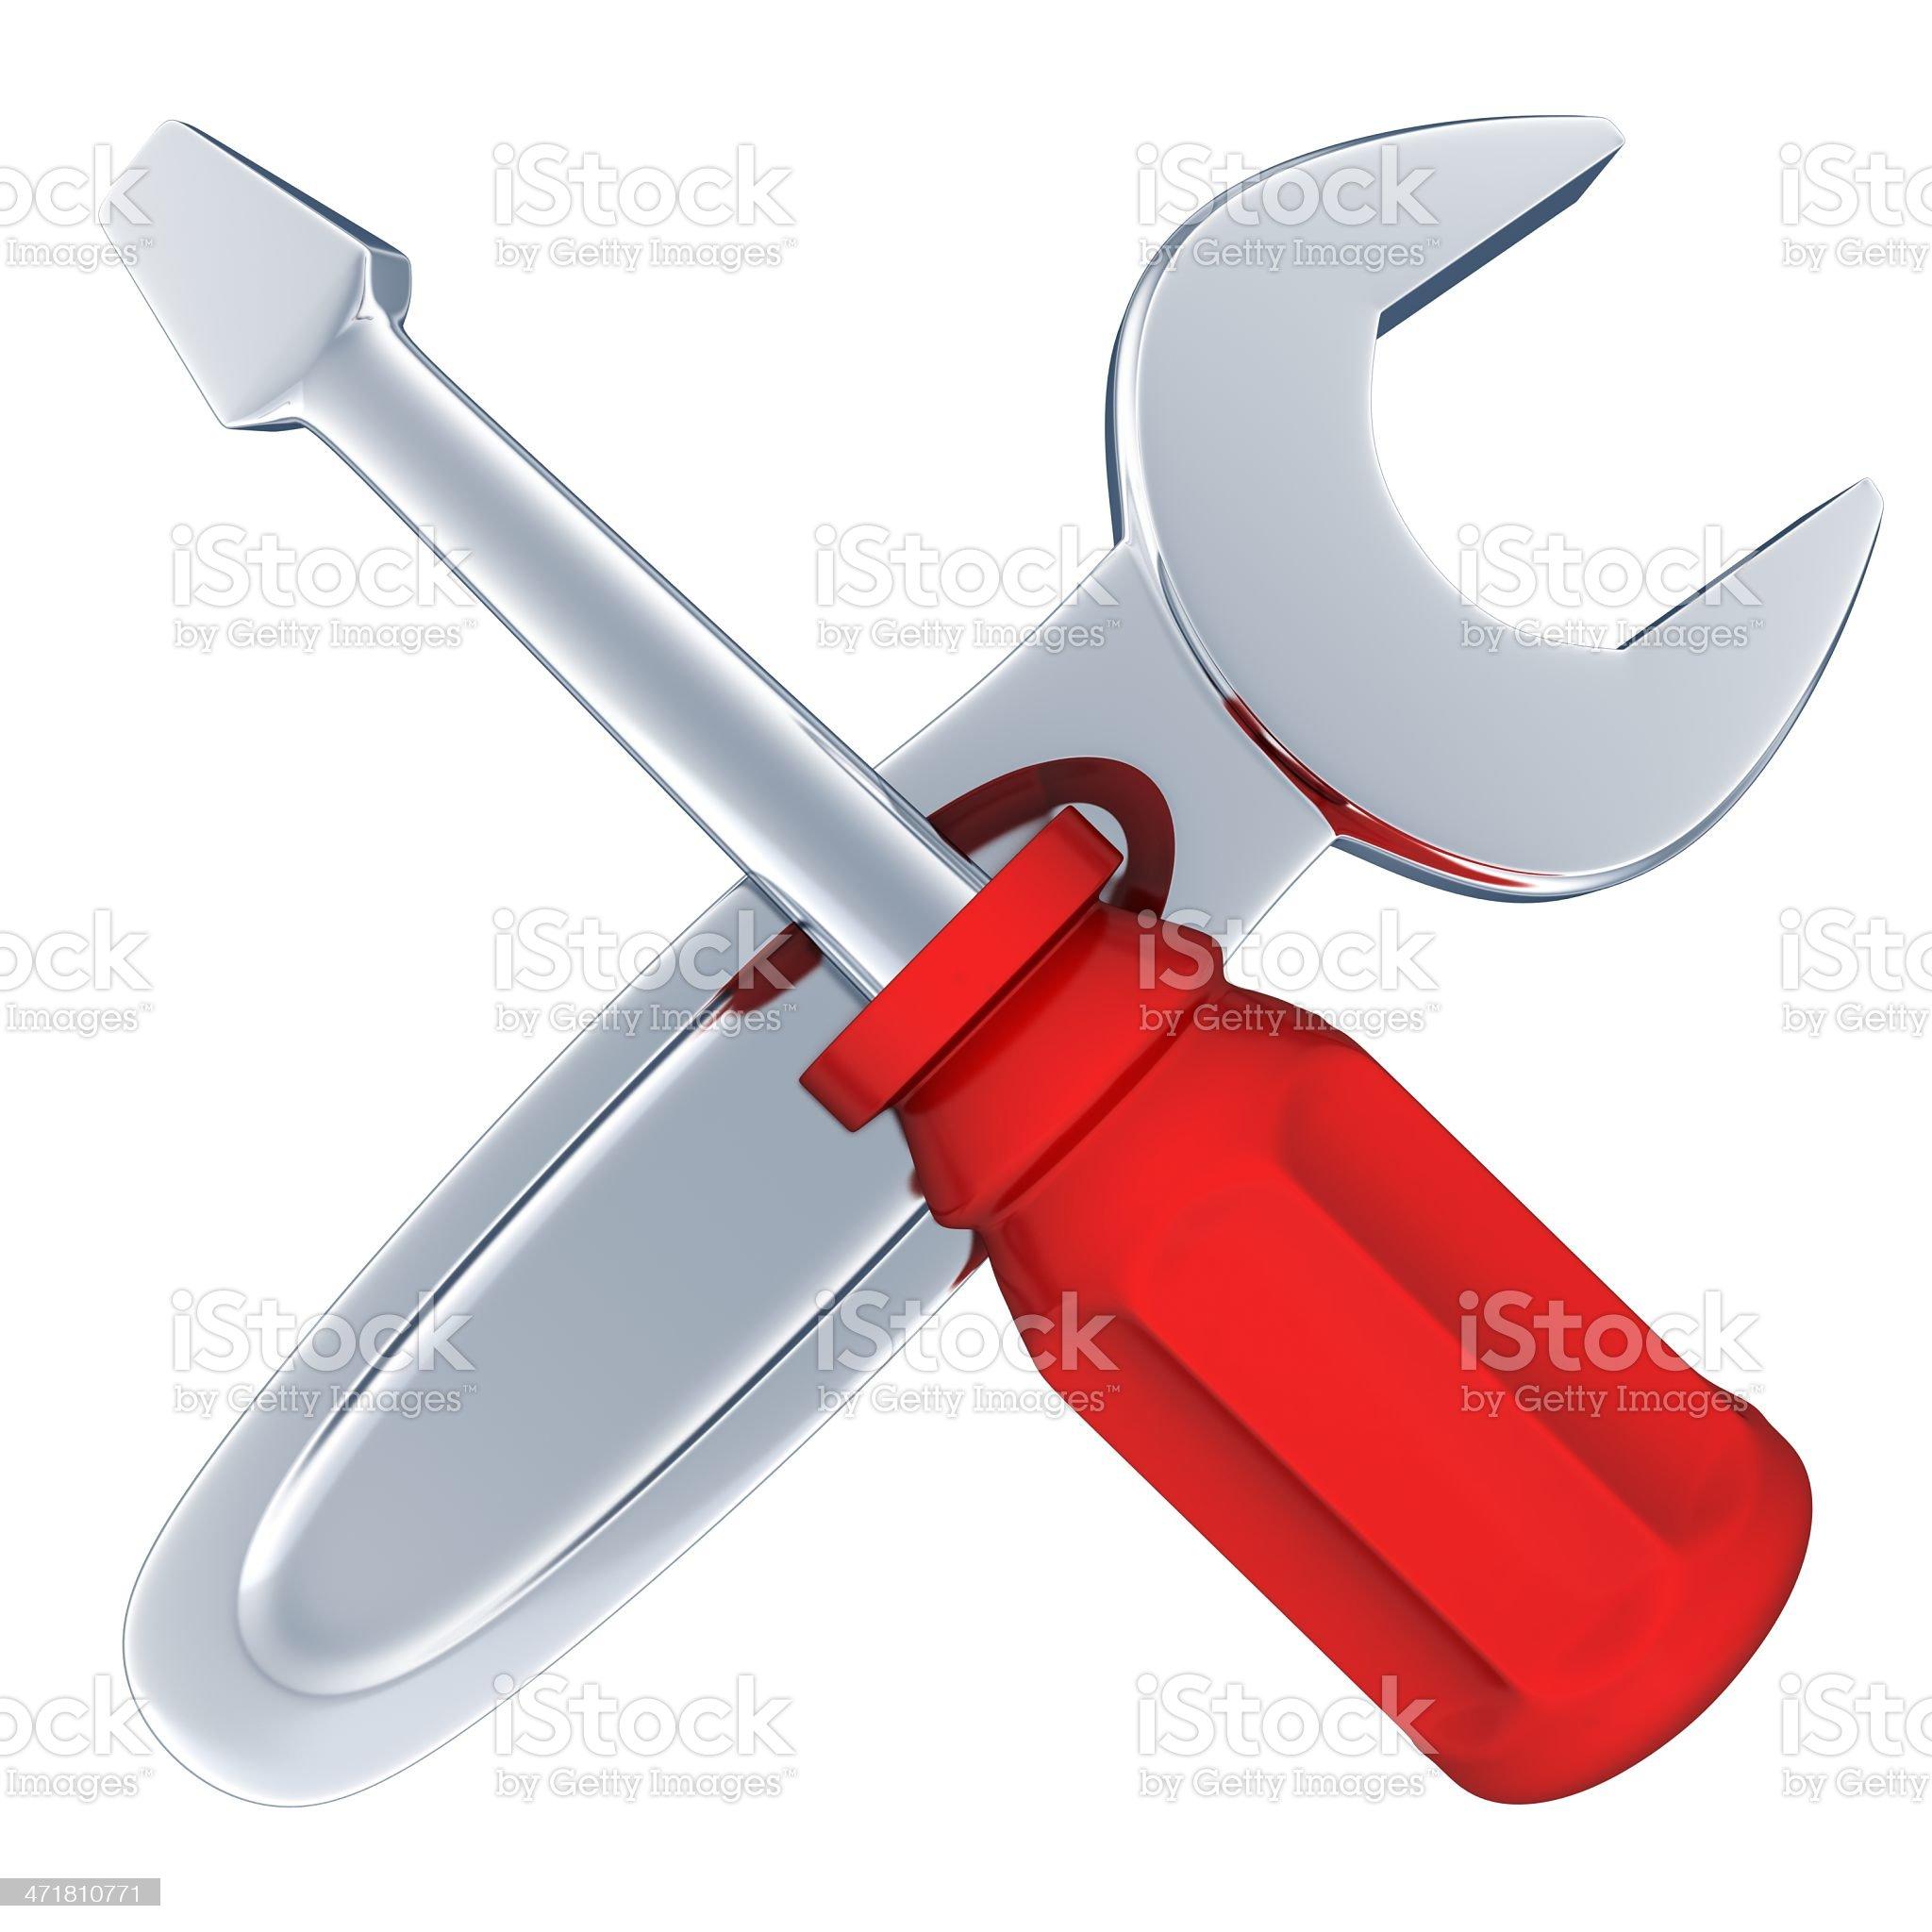 Tools isolated royalty-free stock photo